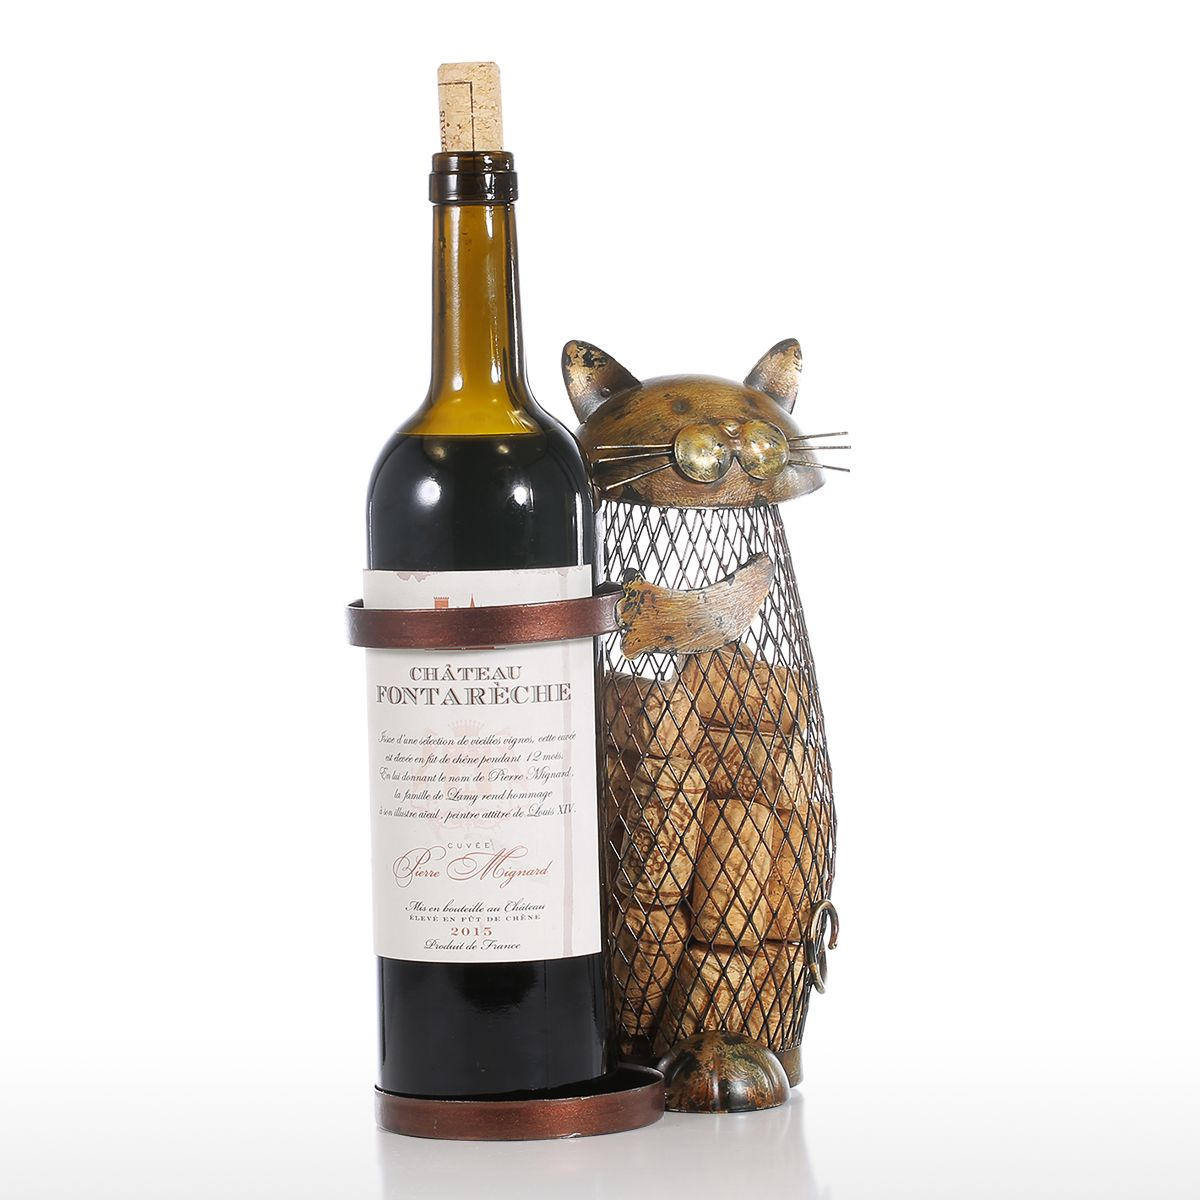 Tooarts Cat Wine Rack Cork Container Bottle Wine Holder Kitchen Bar Metal Wine Craft Christmas Gift Handcraft Animal Wine Stand 14